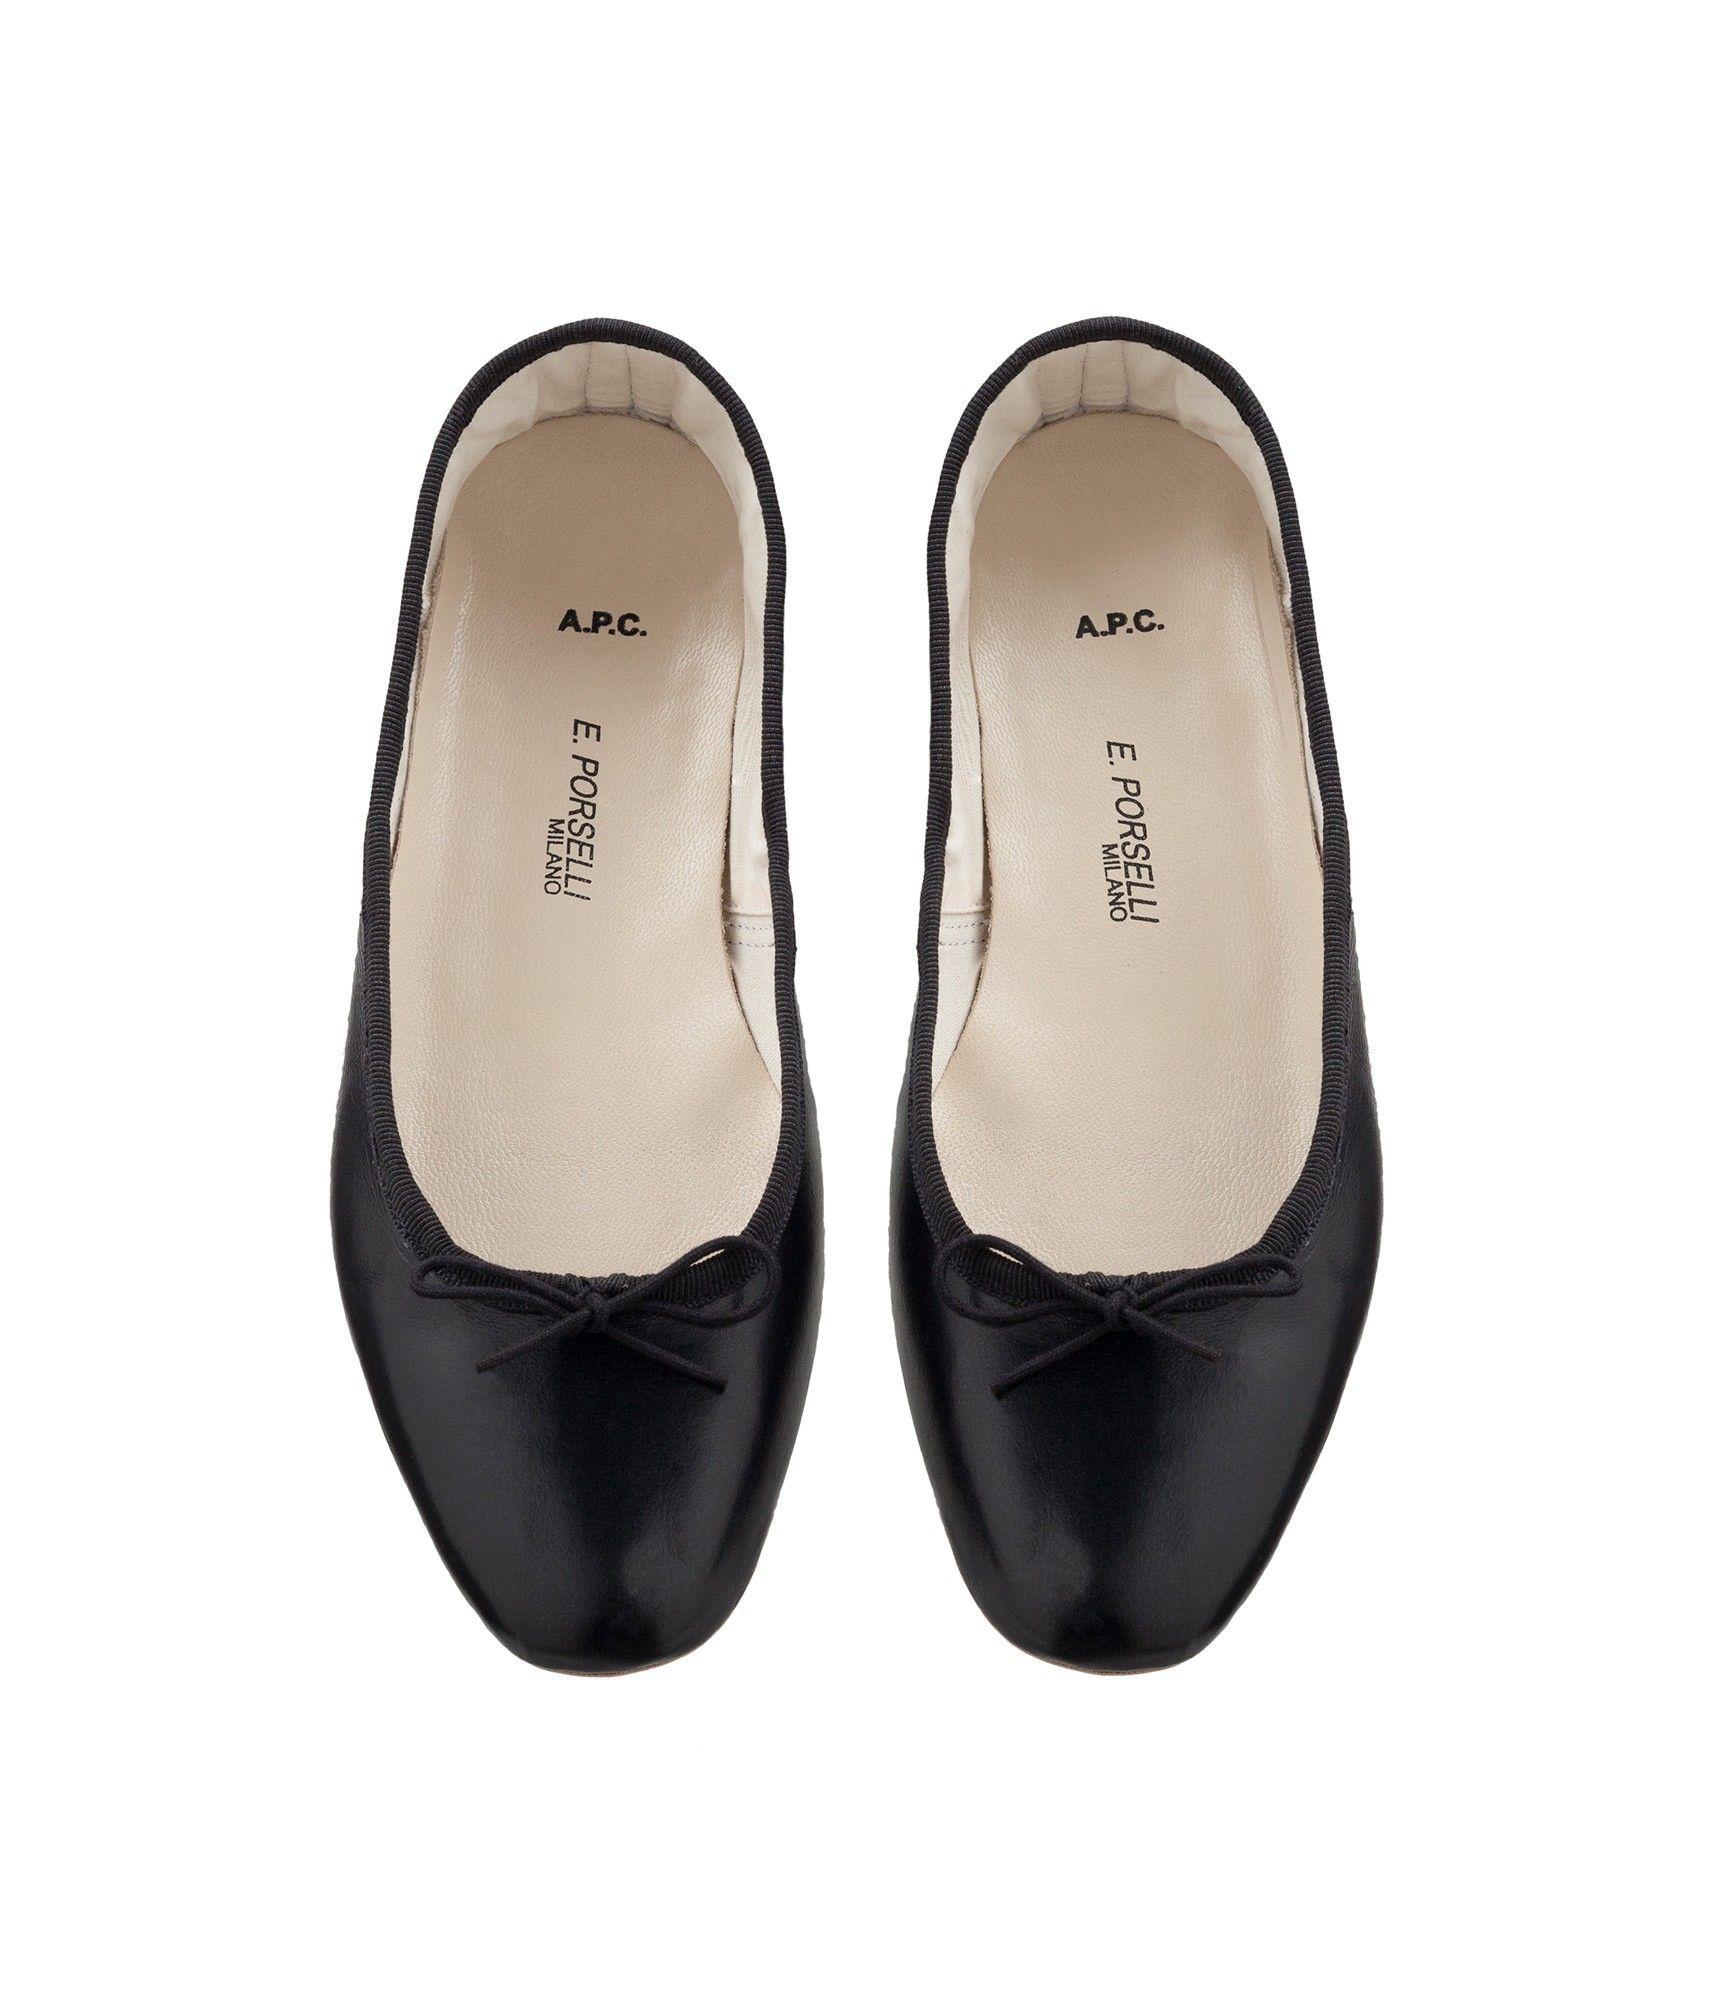 Ballet Flats Ballerina Shoes for Women On Sale, Black, Leather, 2017, 3.5 Acne Studios